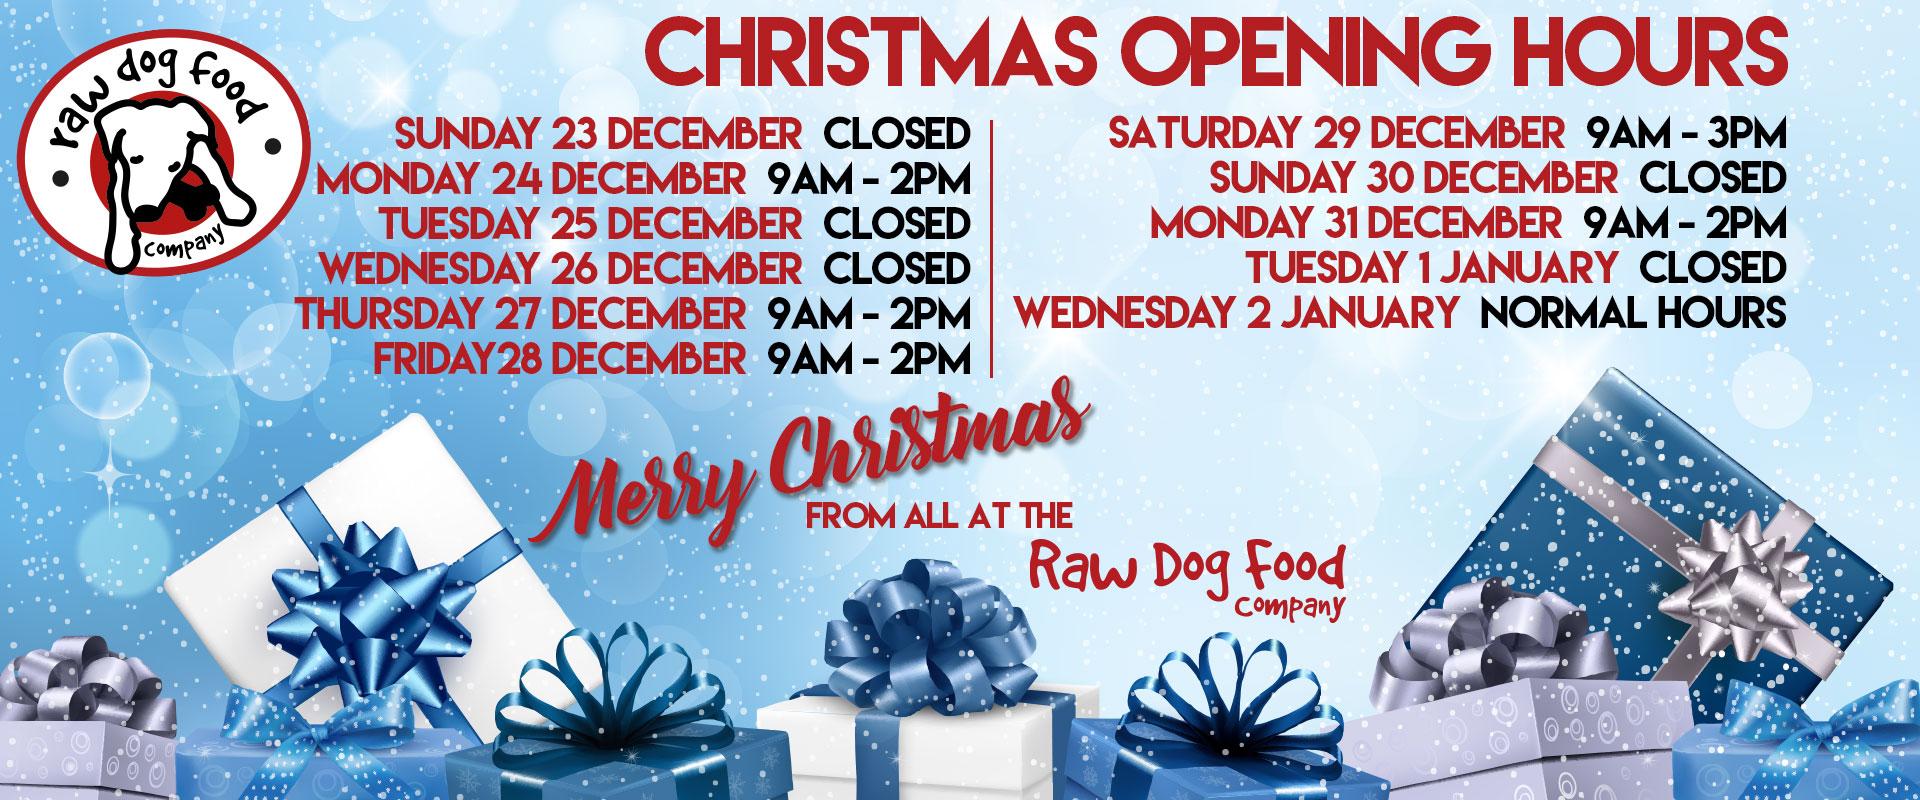 Raw Dog Food Company Christmas OPening Times 2018